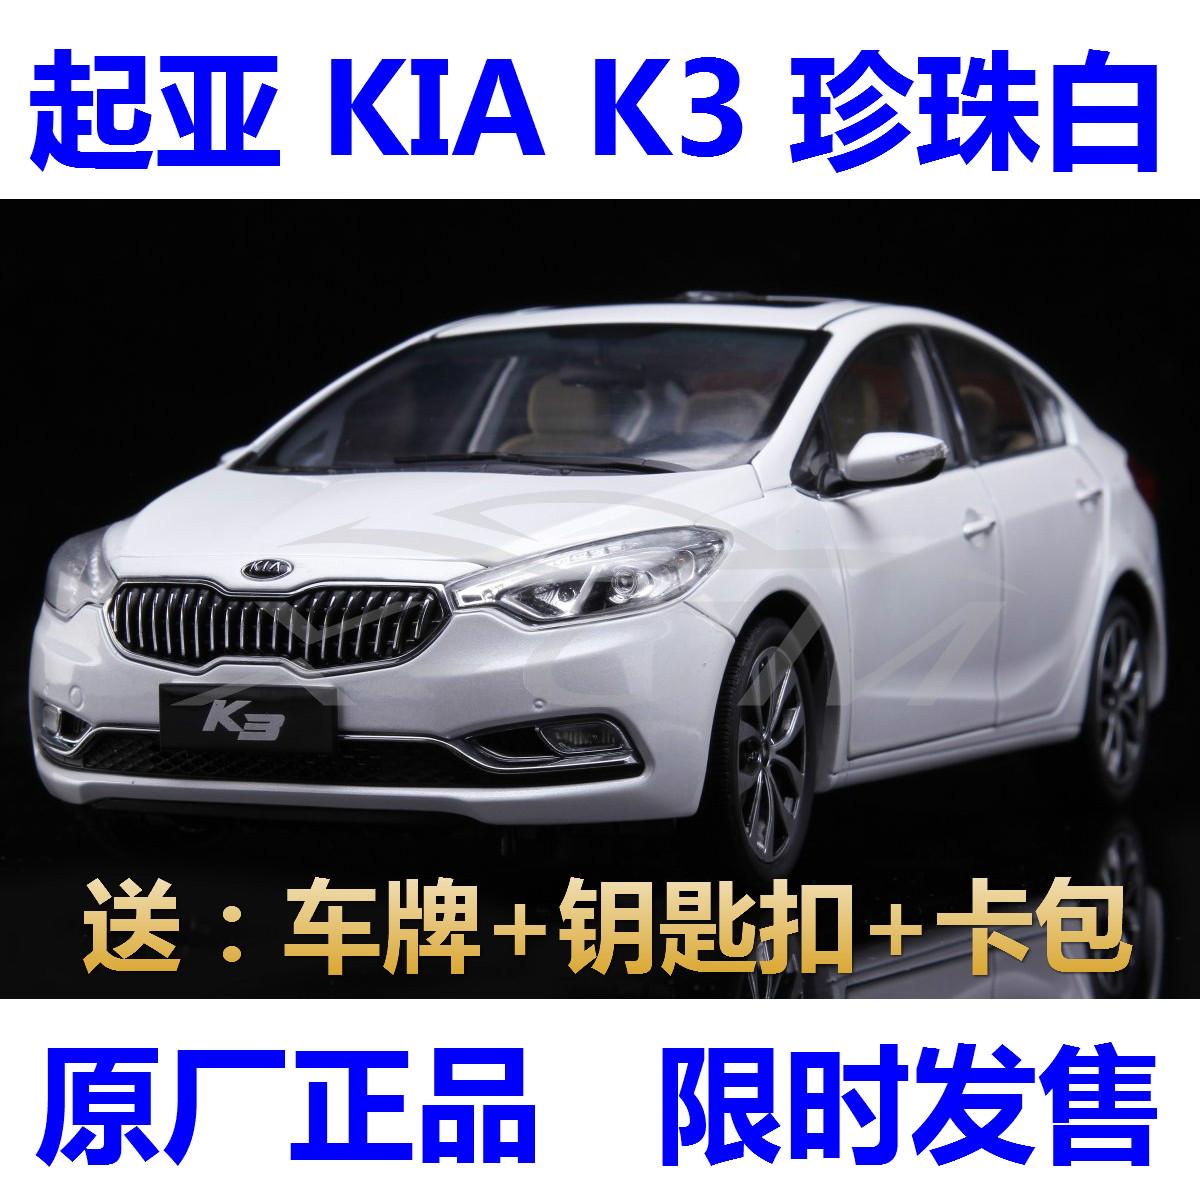 Модель машины Kia 1:18 K3 K3 FORTE